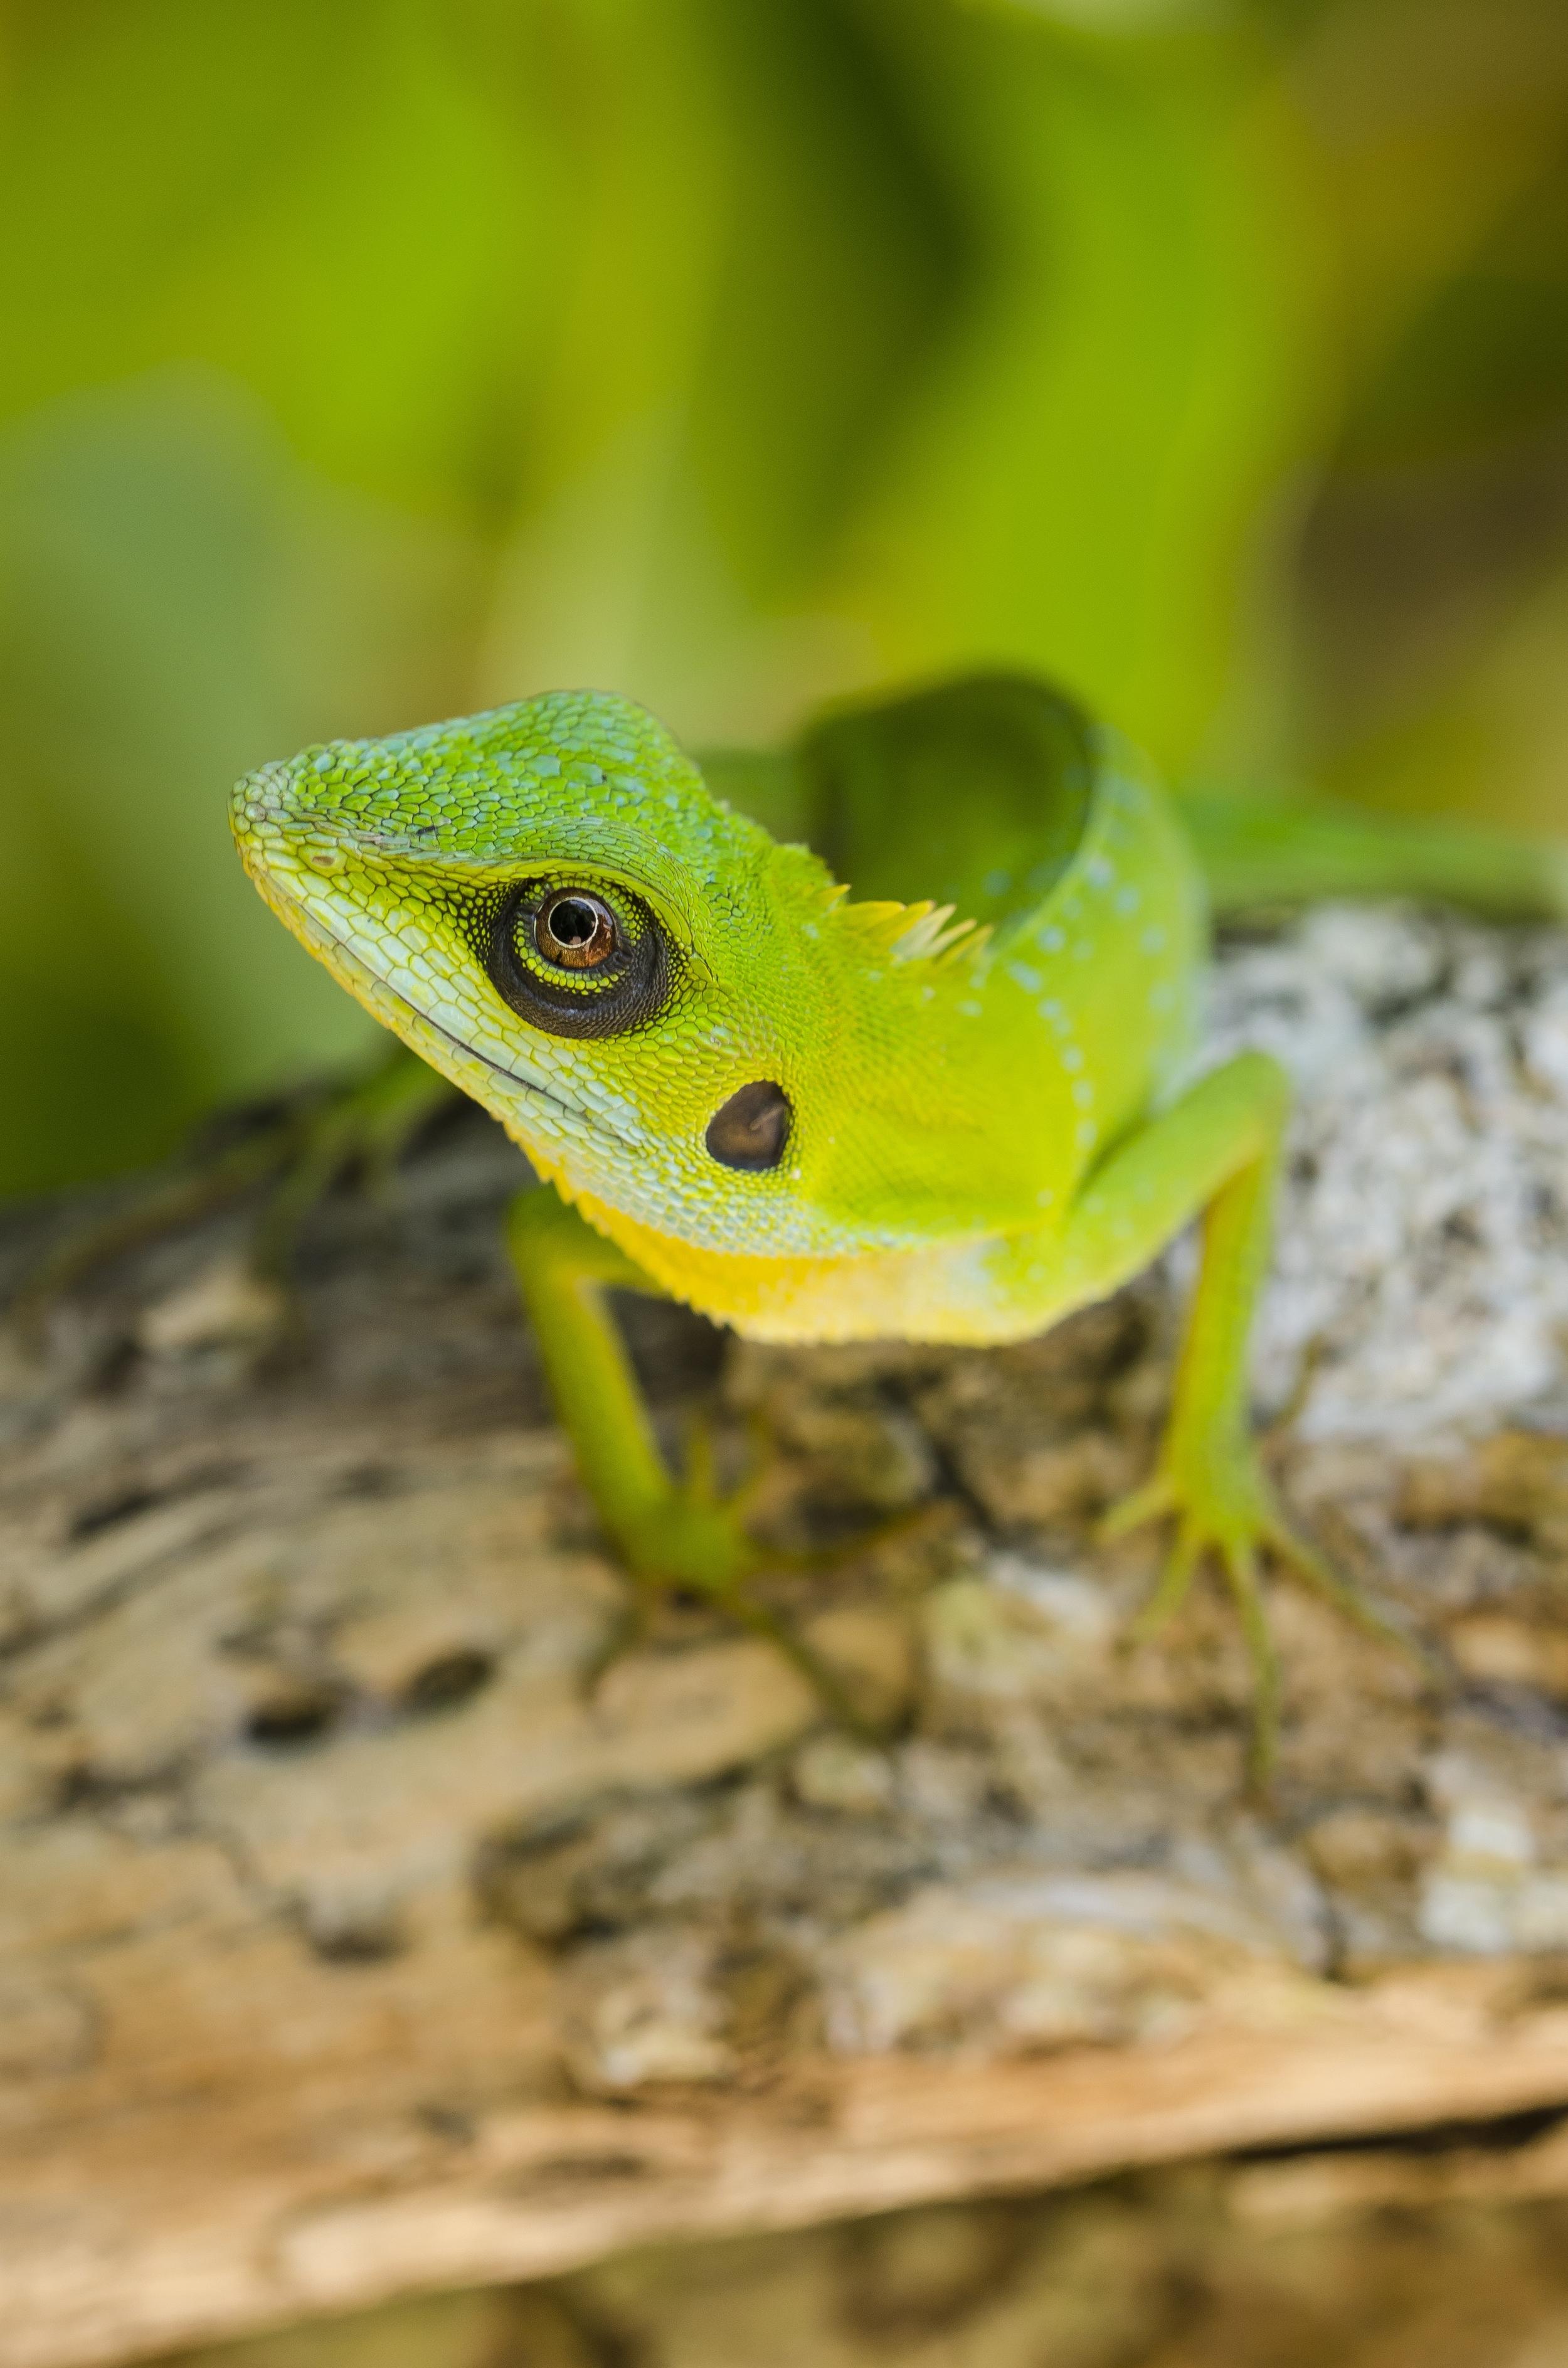 Green-crested Lizard - Perhentian Islands